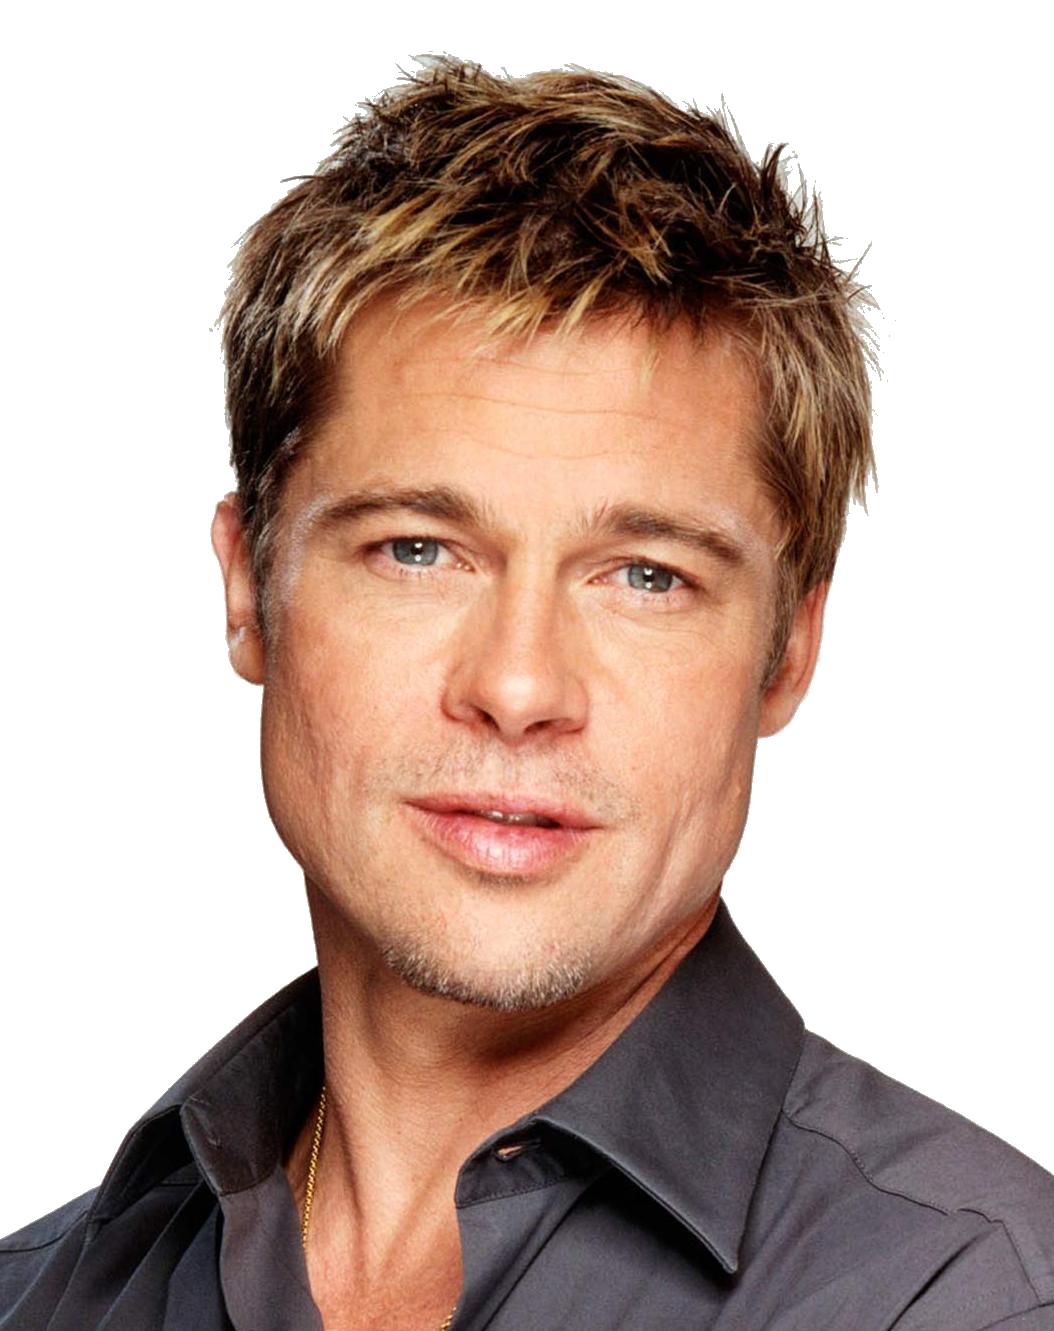 Celebrities Brad Pitt Haircut Brad Pitt Brad Pitt Hair